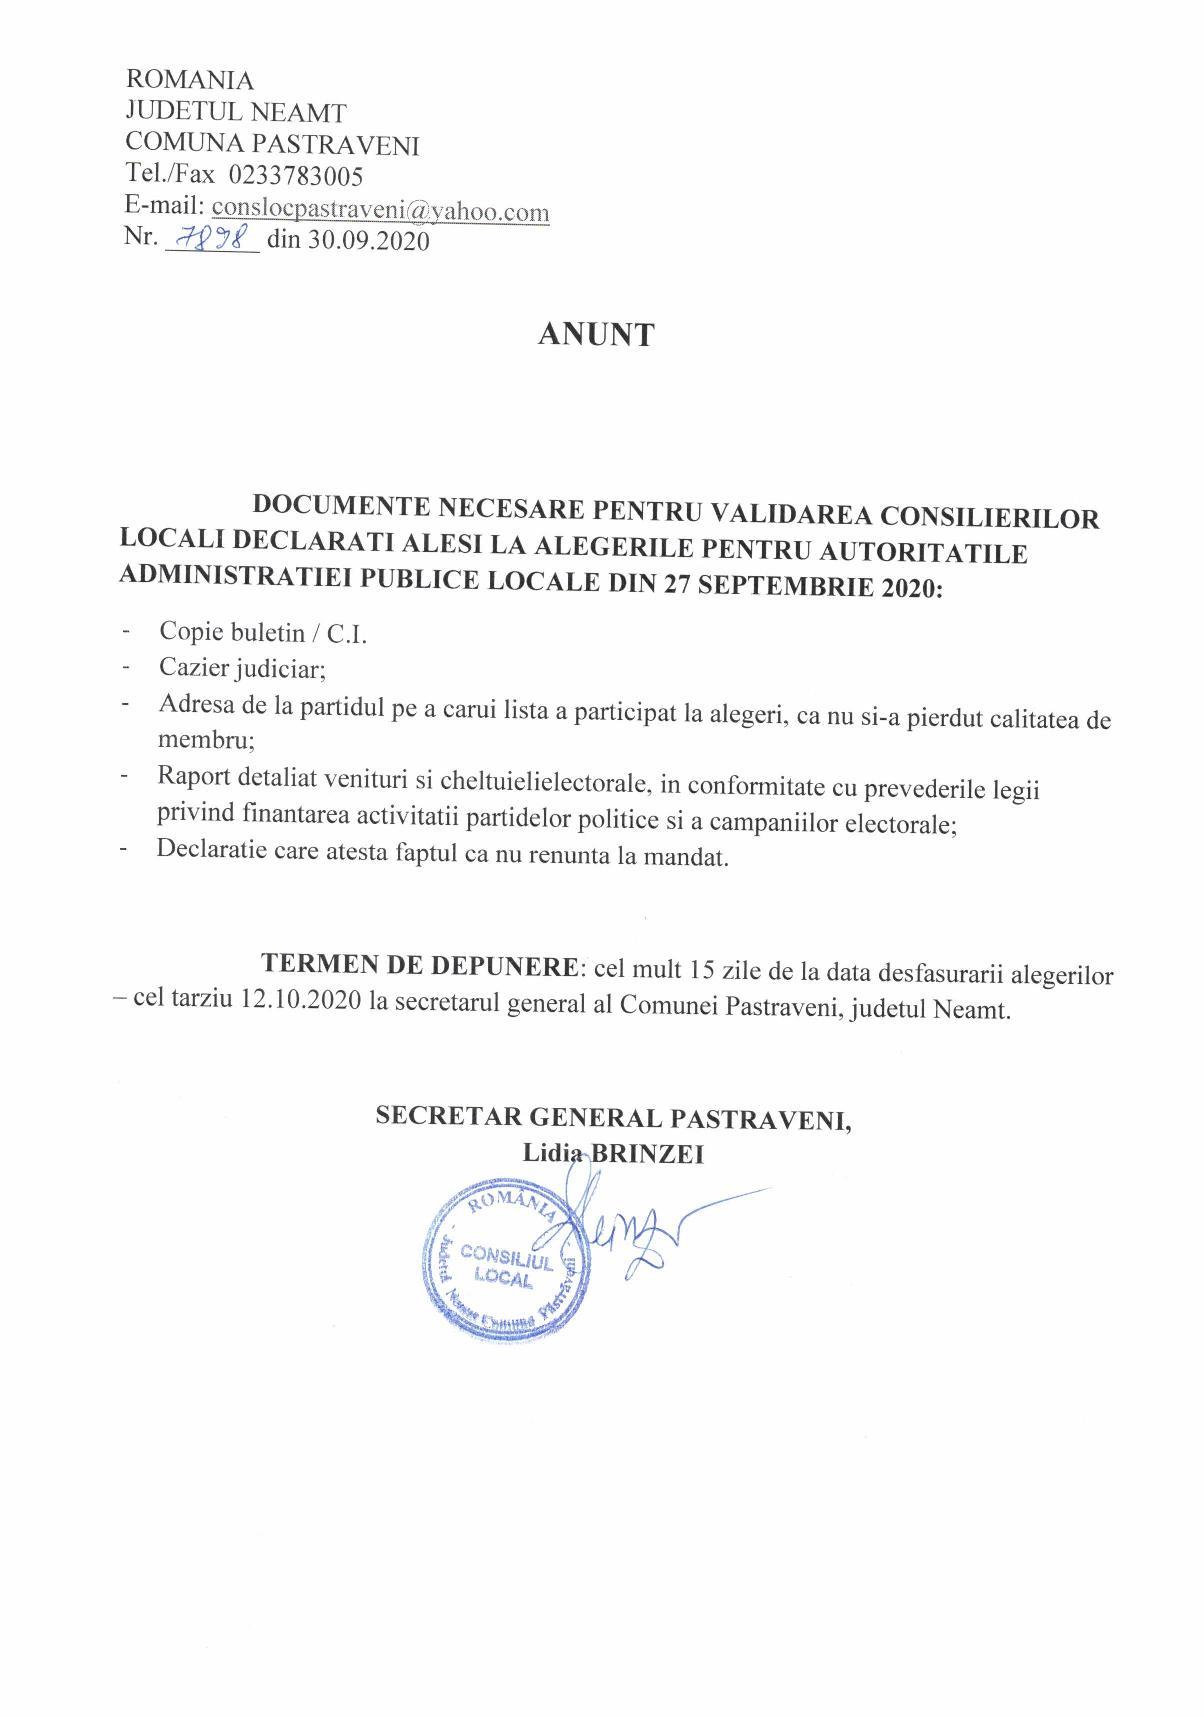 anunt documente necesare validare consilieri locali-page-001